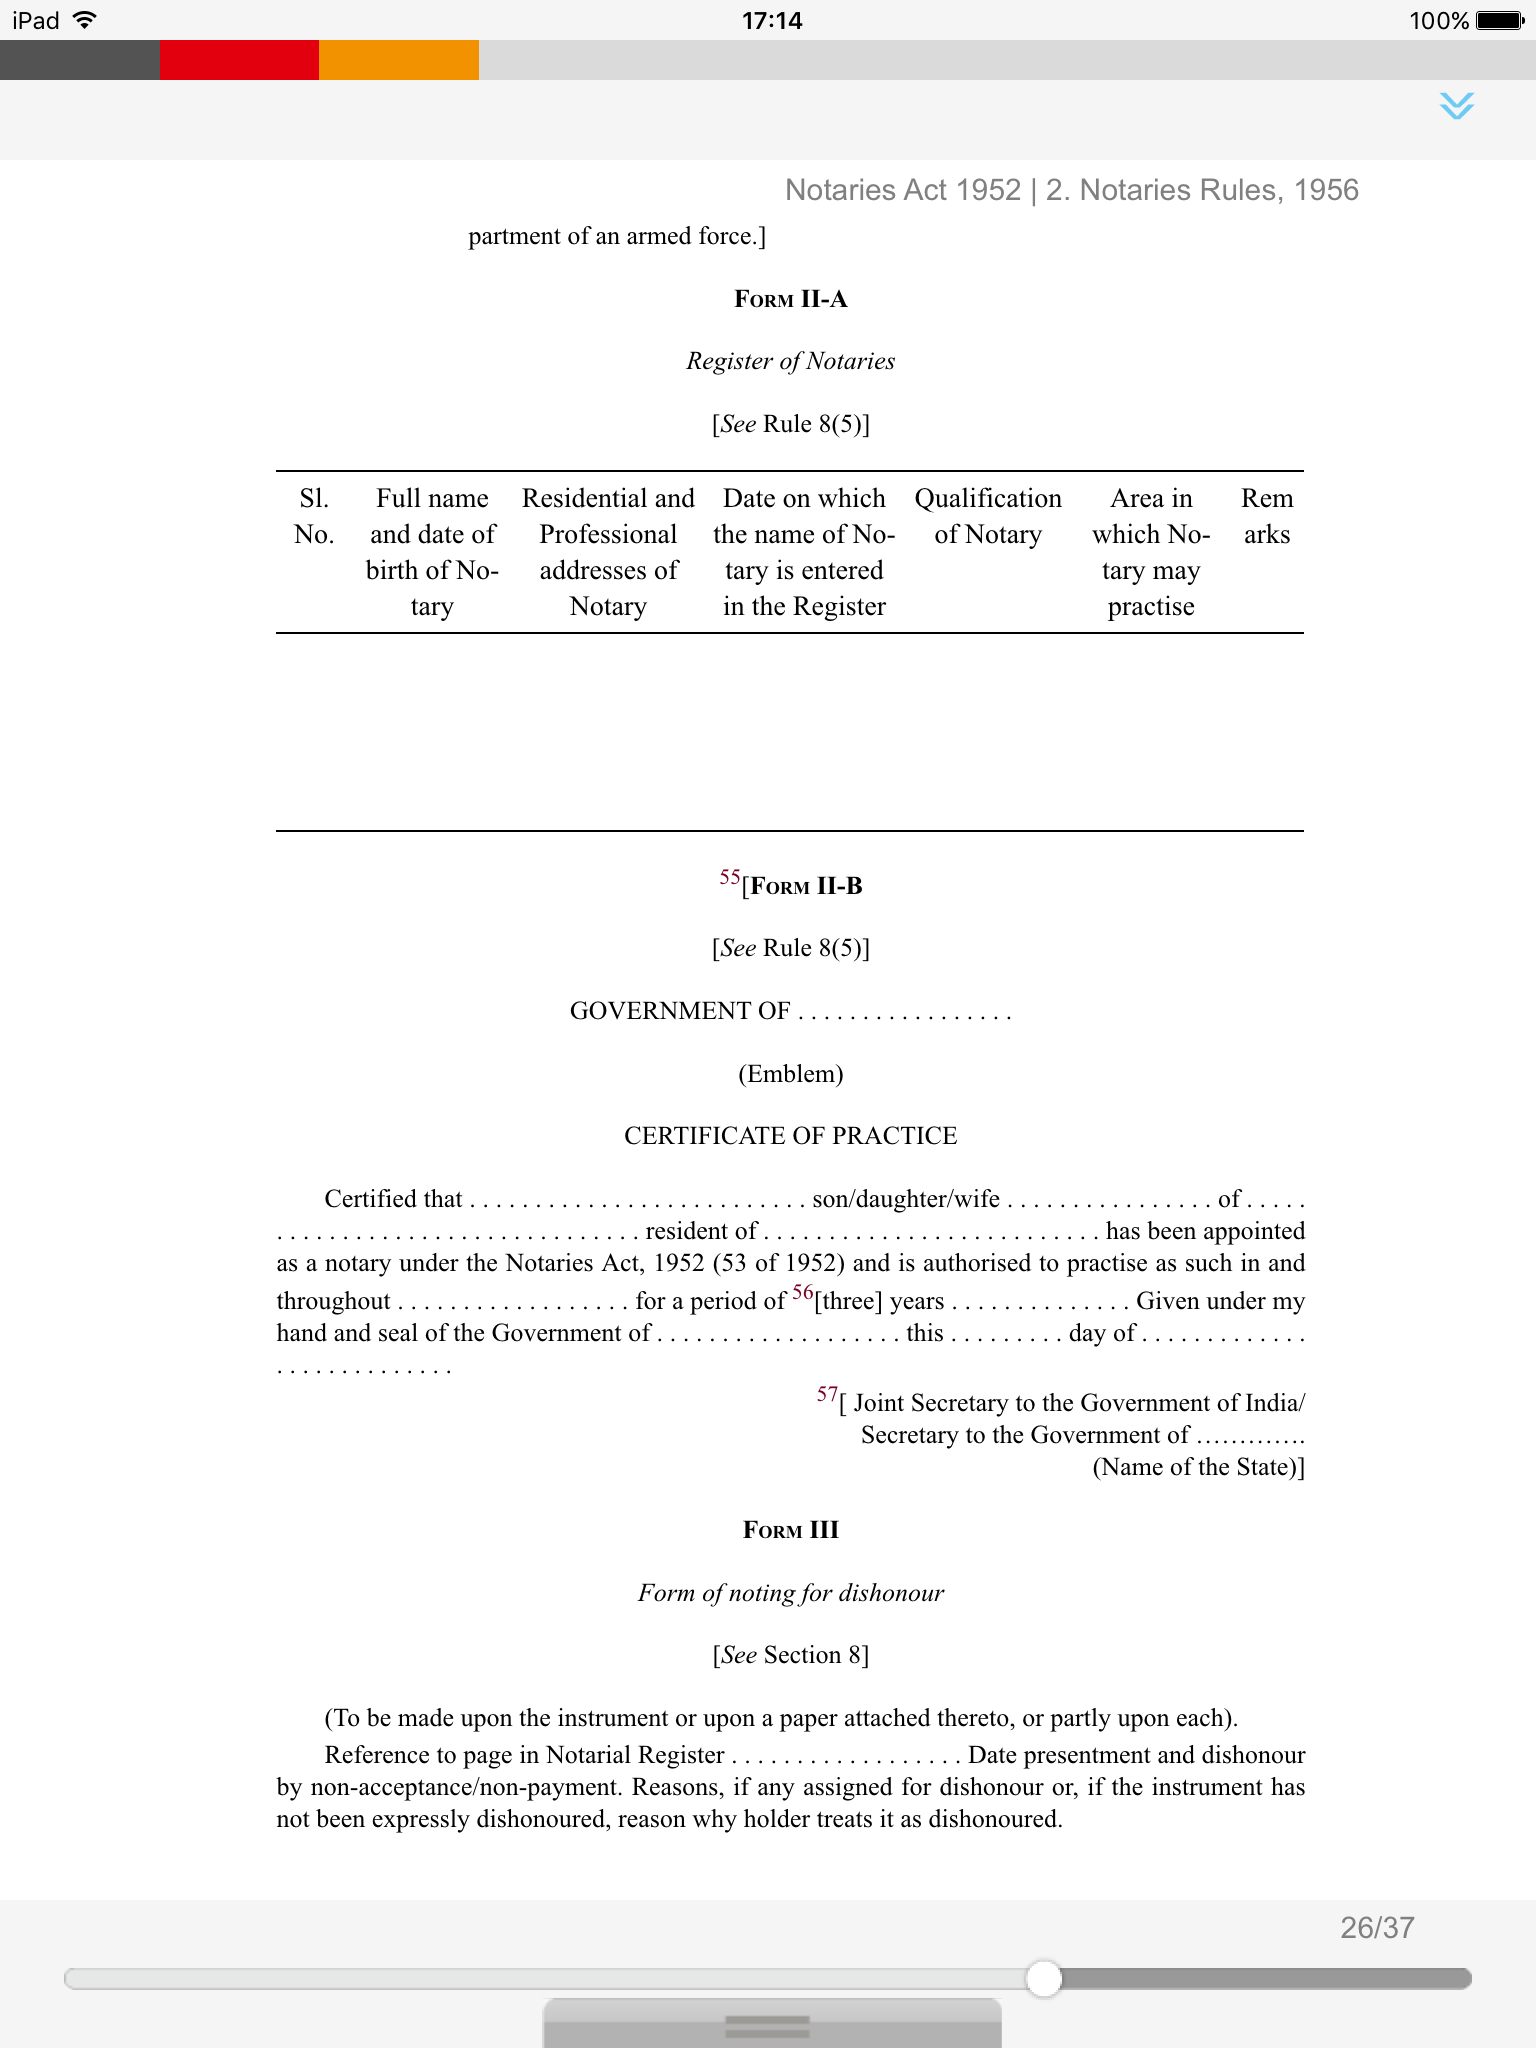 Notaries Act 1952 Download